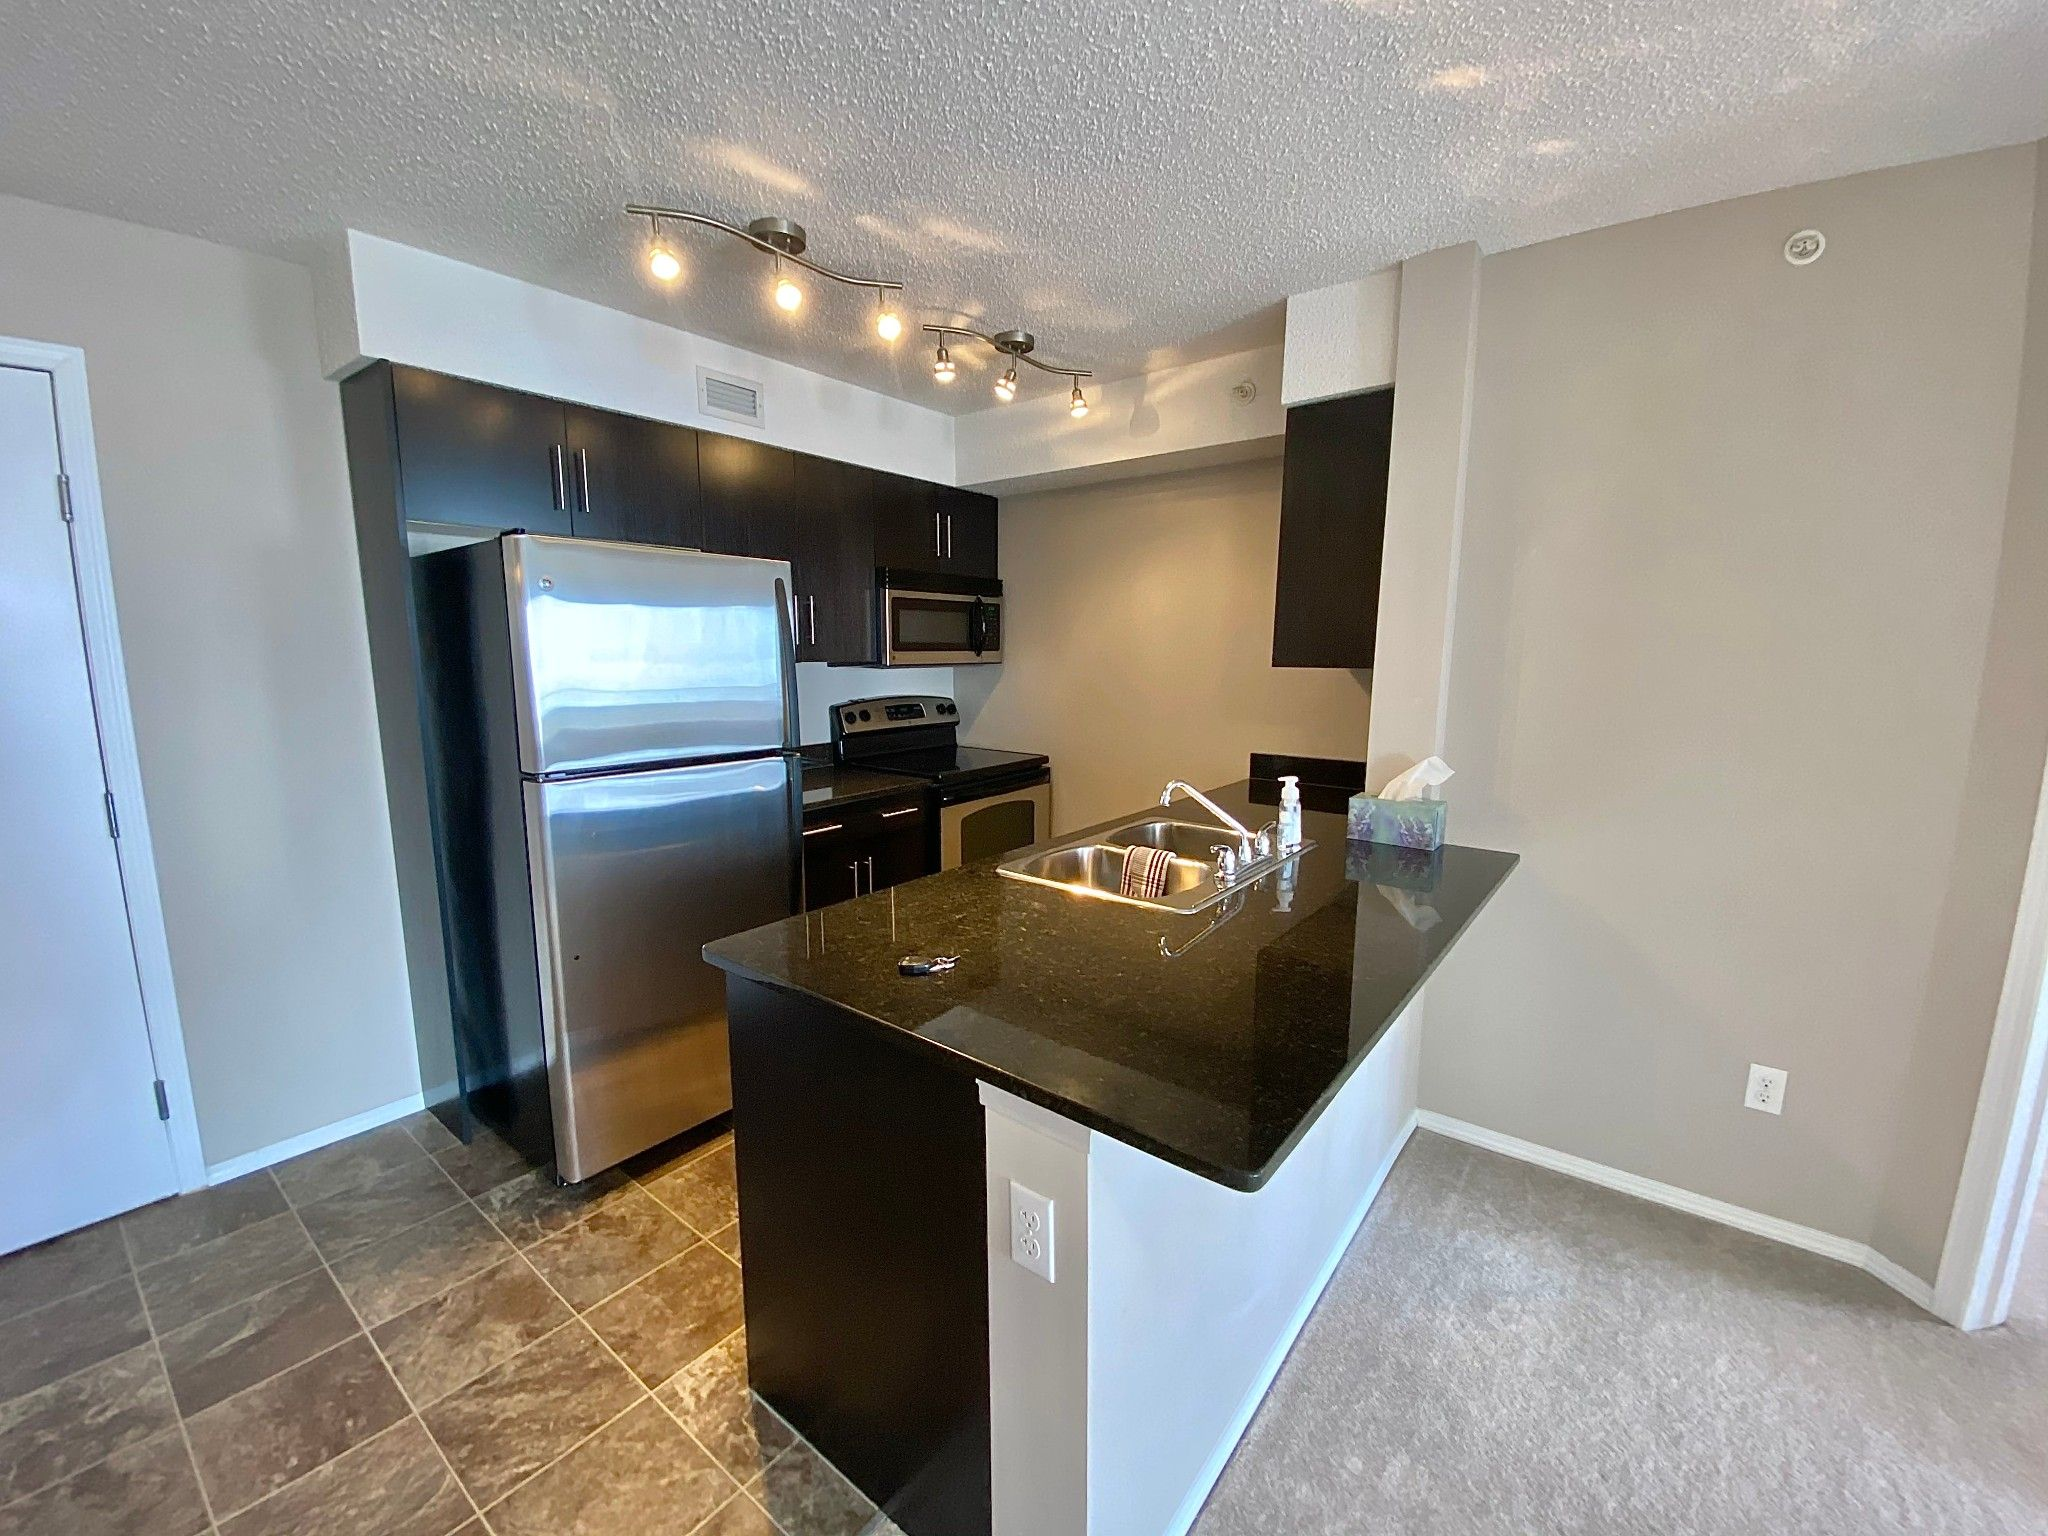 Main Photo: 11812 22 Ave in Edmonton: Condo for rent